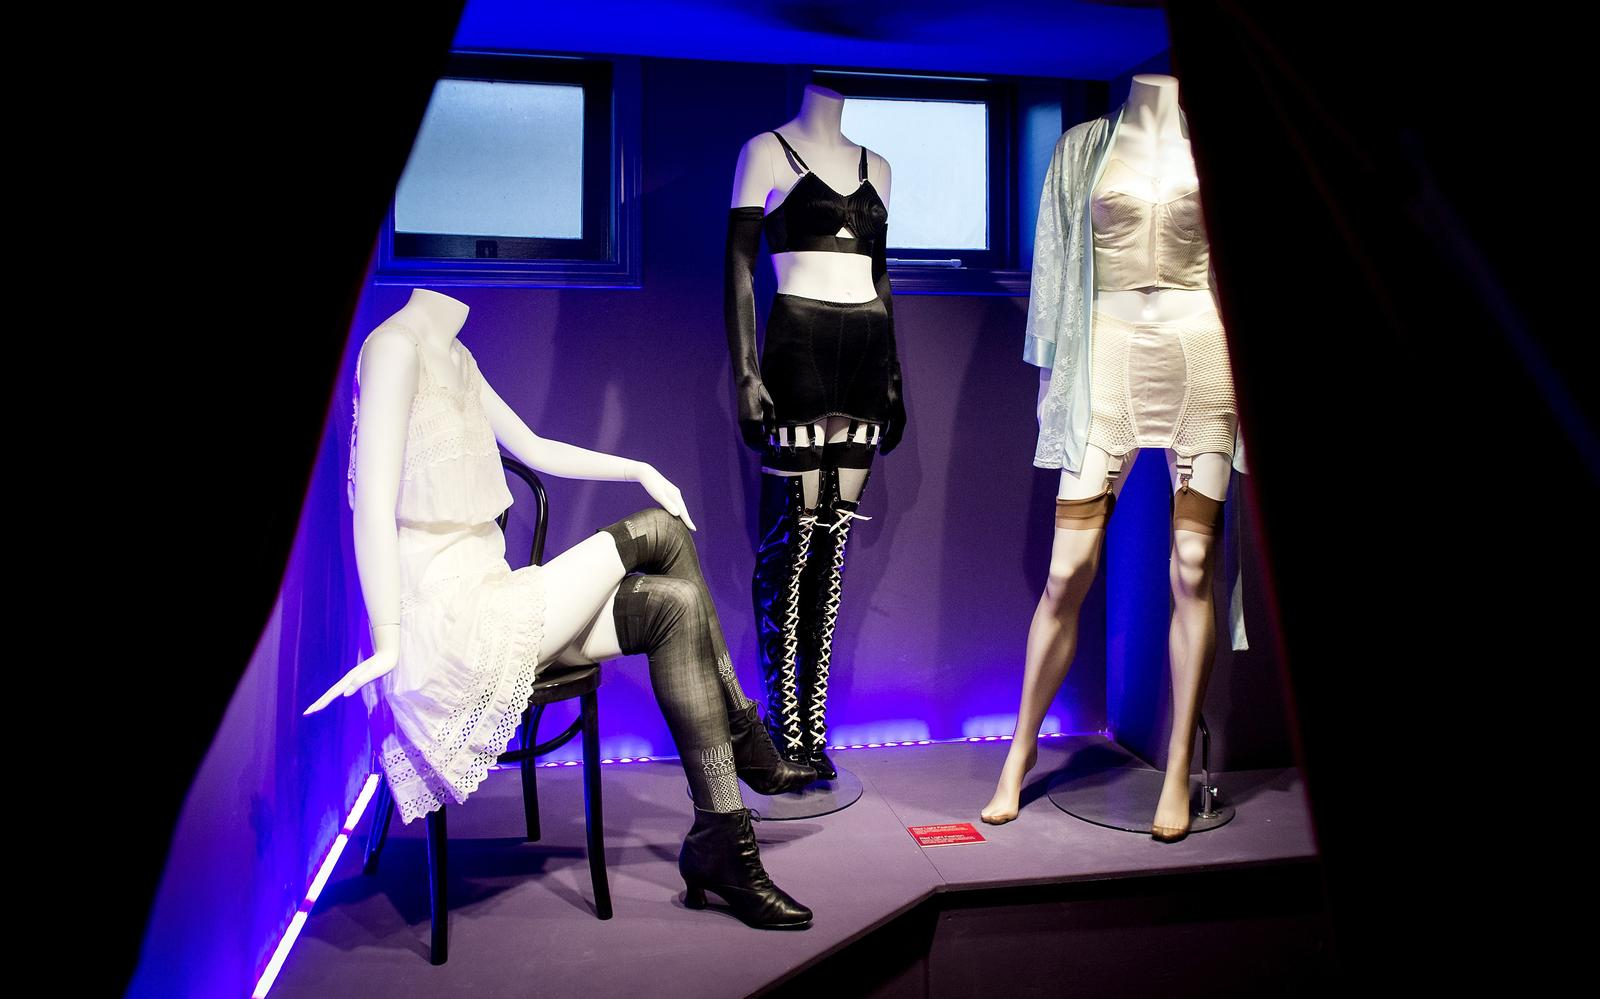 roboti-prostitutki-v-amsterdame